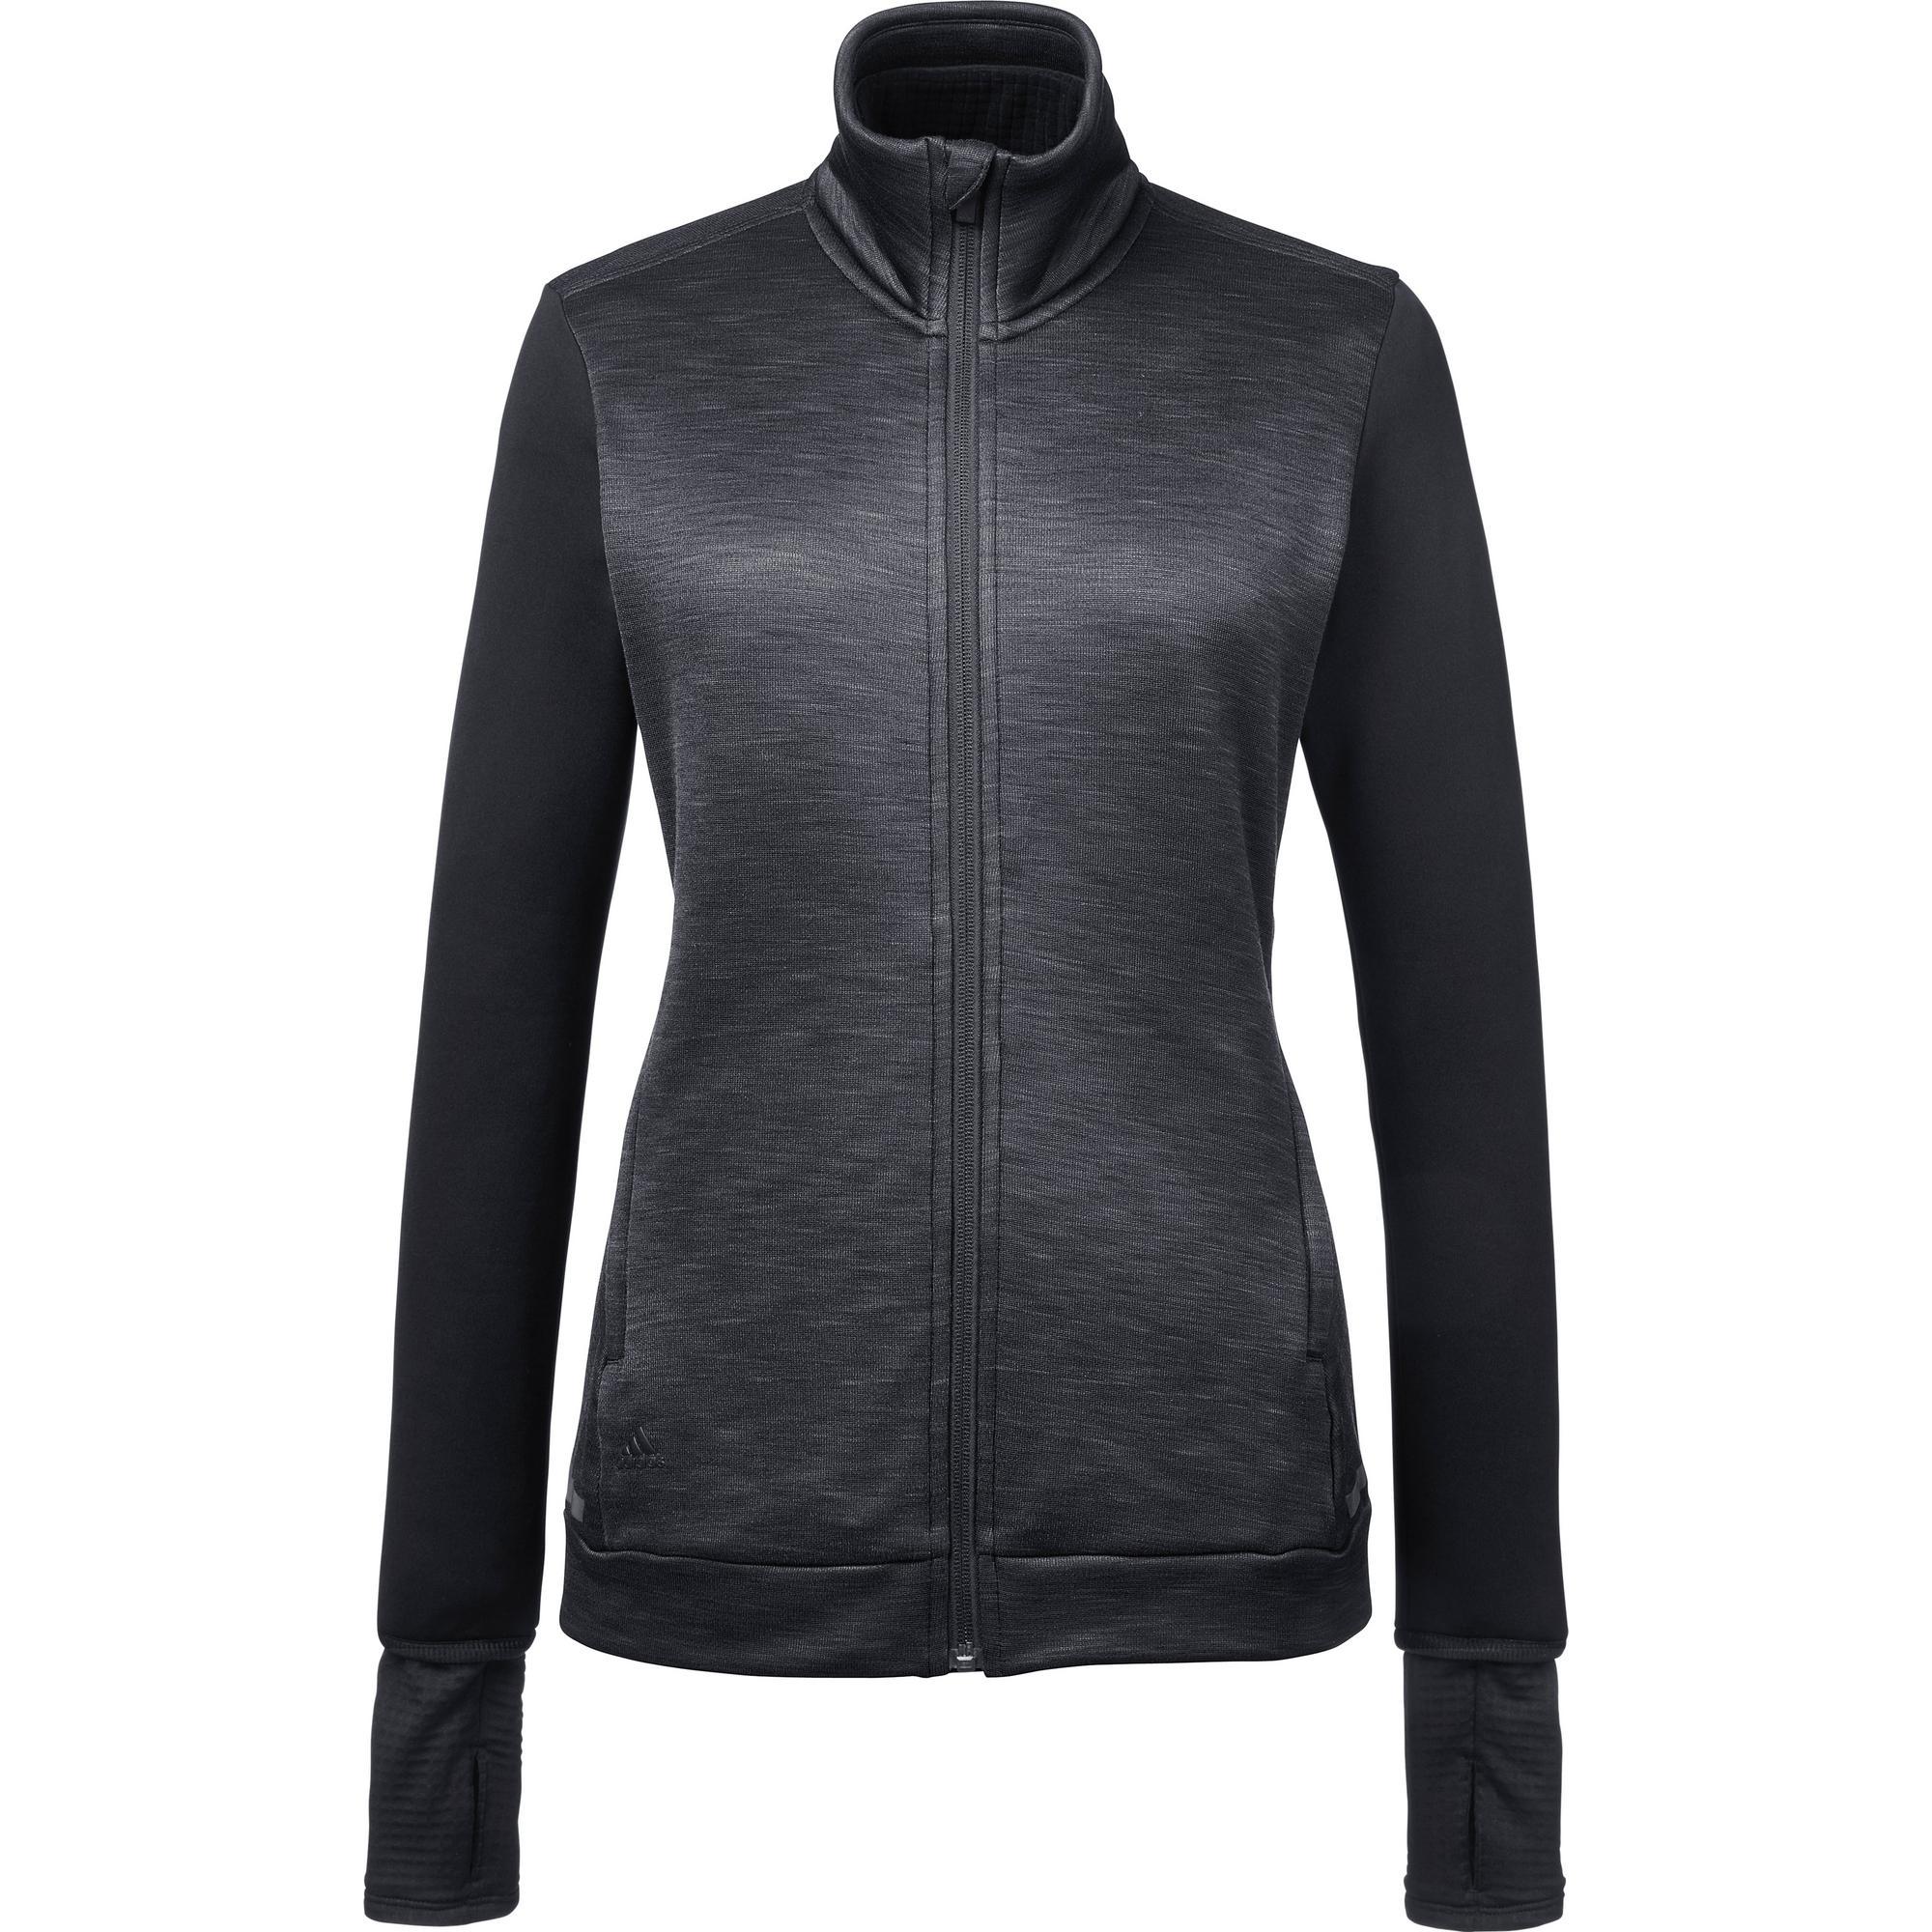 Women's Climaheat Full Zip Jacket